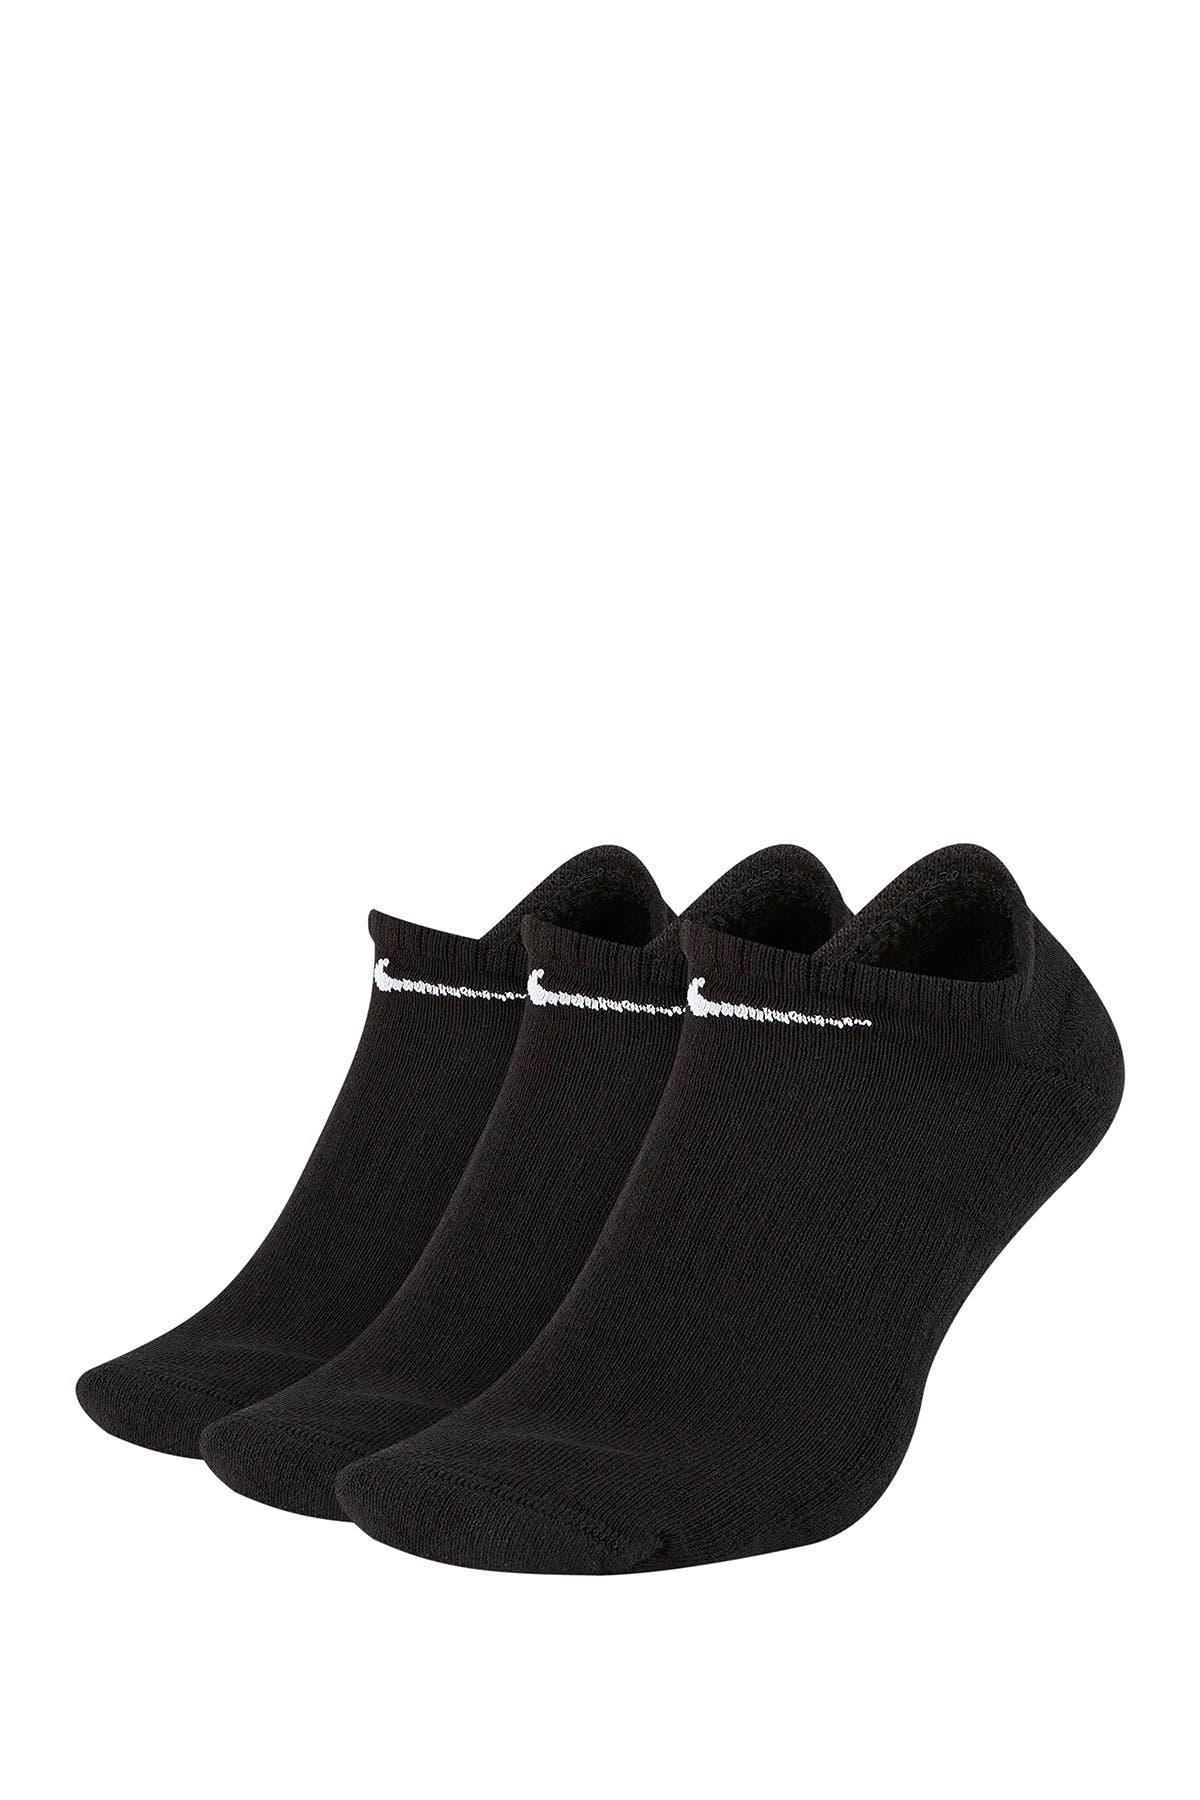 Image of Nike Everyday Cushion Training No-Show Socks - Pack of 3